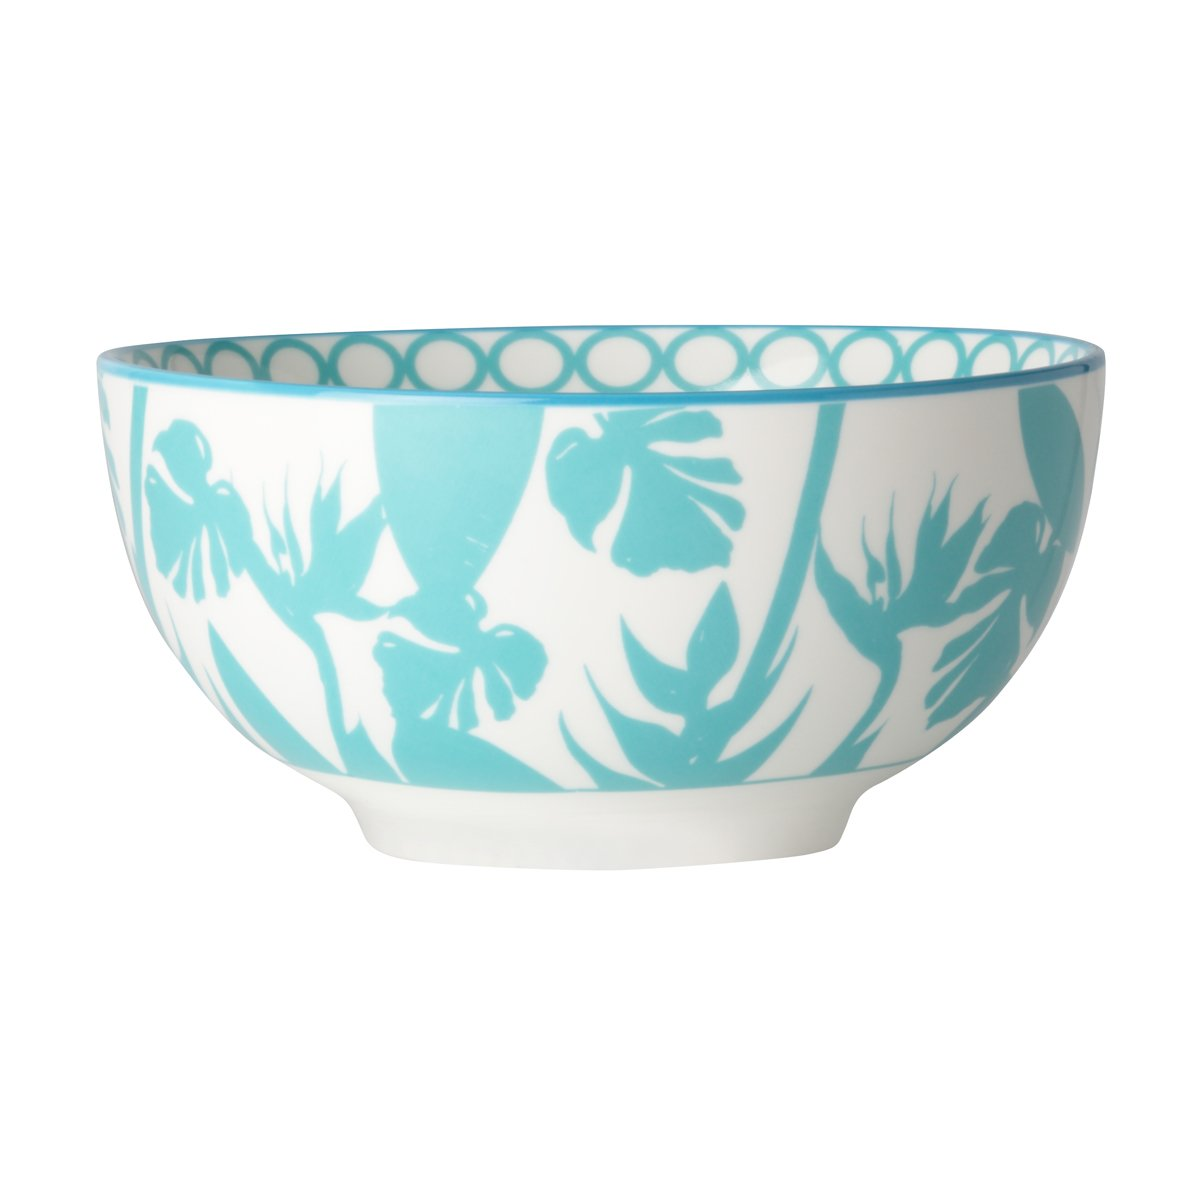 CHRISTOPHER VINE Paradiso Paradiso Coppa media Bowl 15.5cm Silhouette Blue AW0046